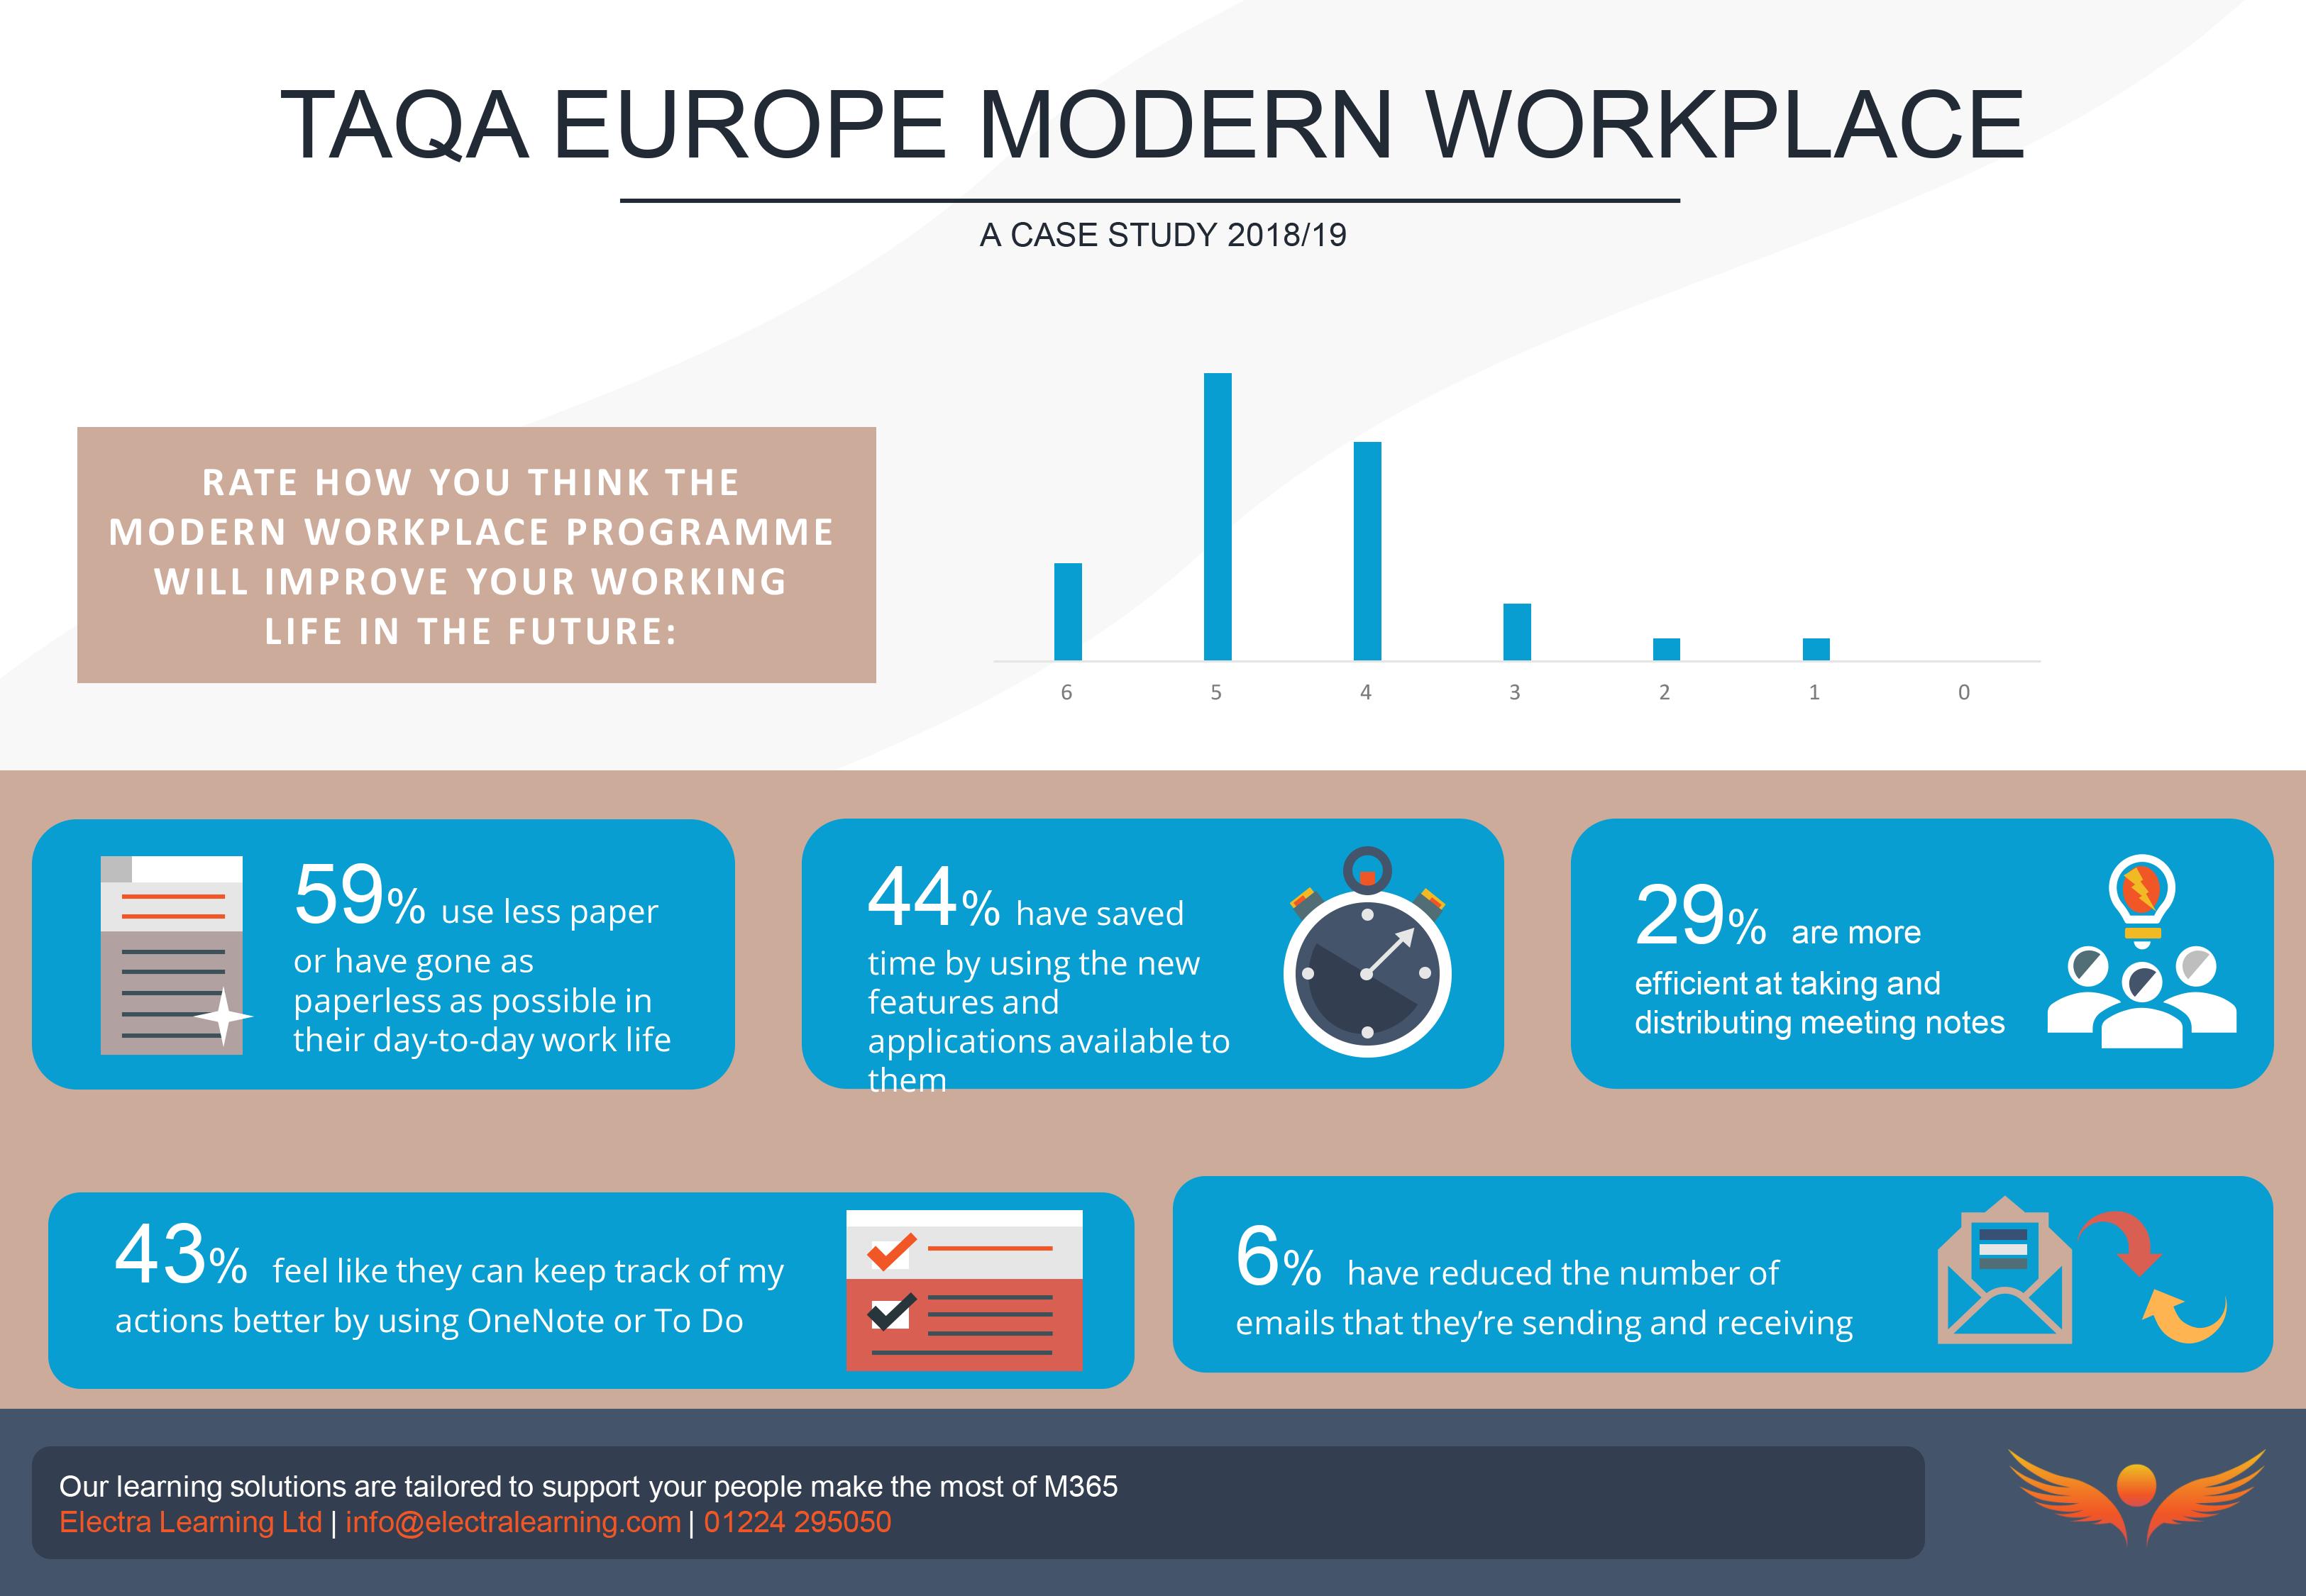 TAQA Europe Modern Workplace Case Study